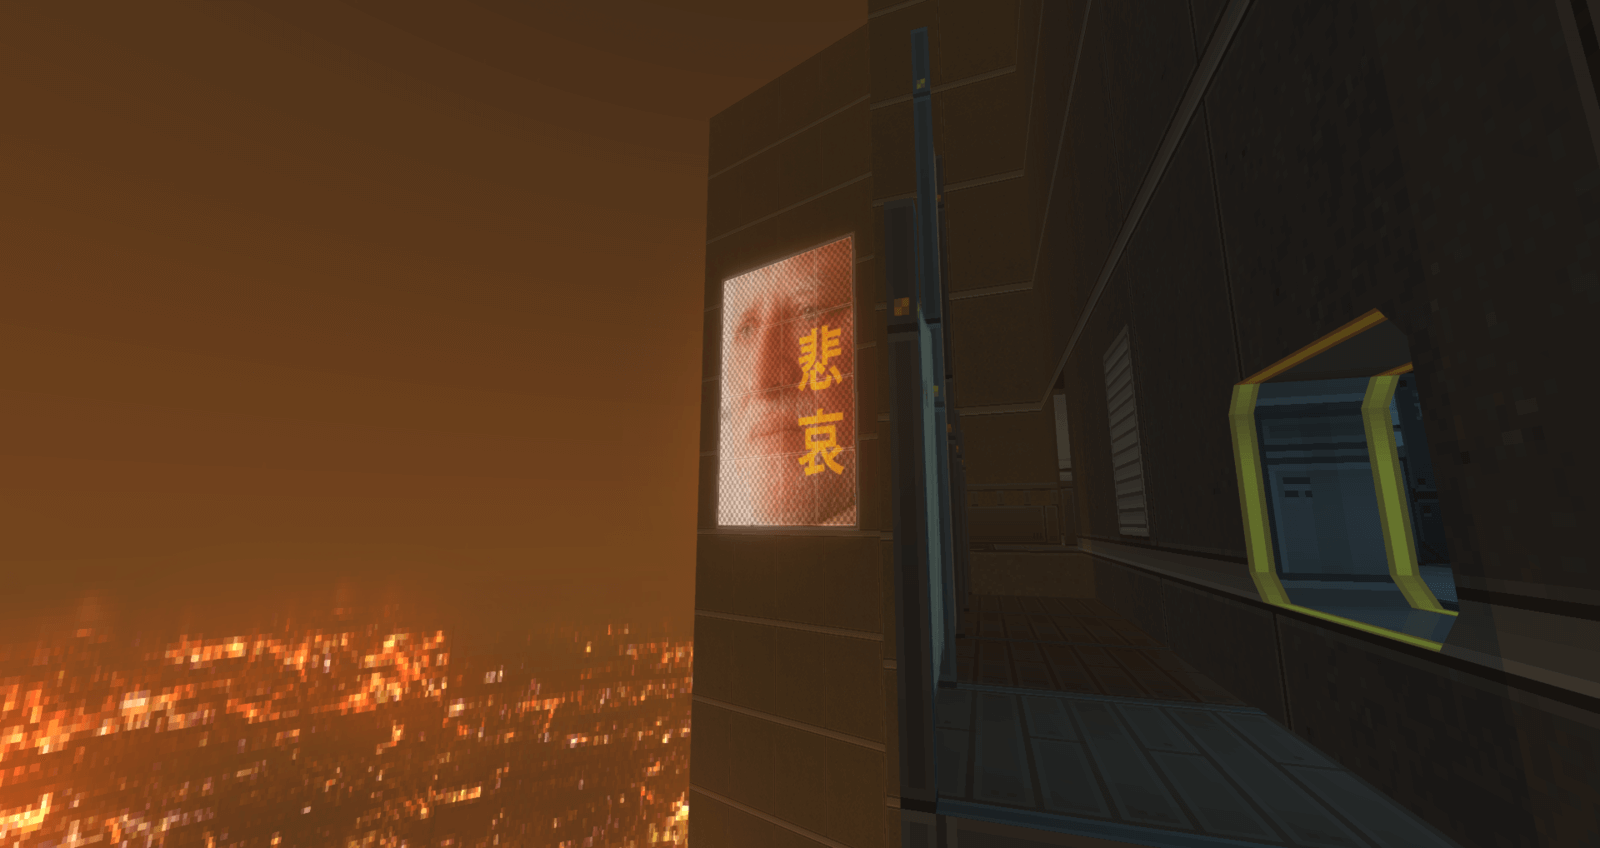 Doom meets Deus Ex in this custom exploration-heavy cyberpunk map